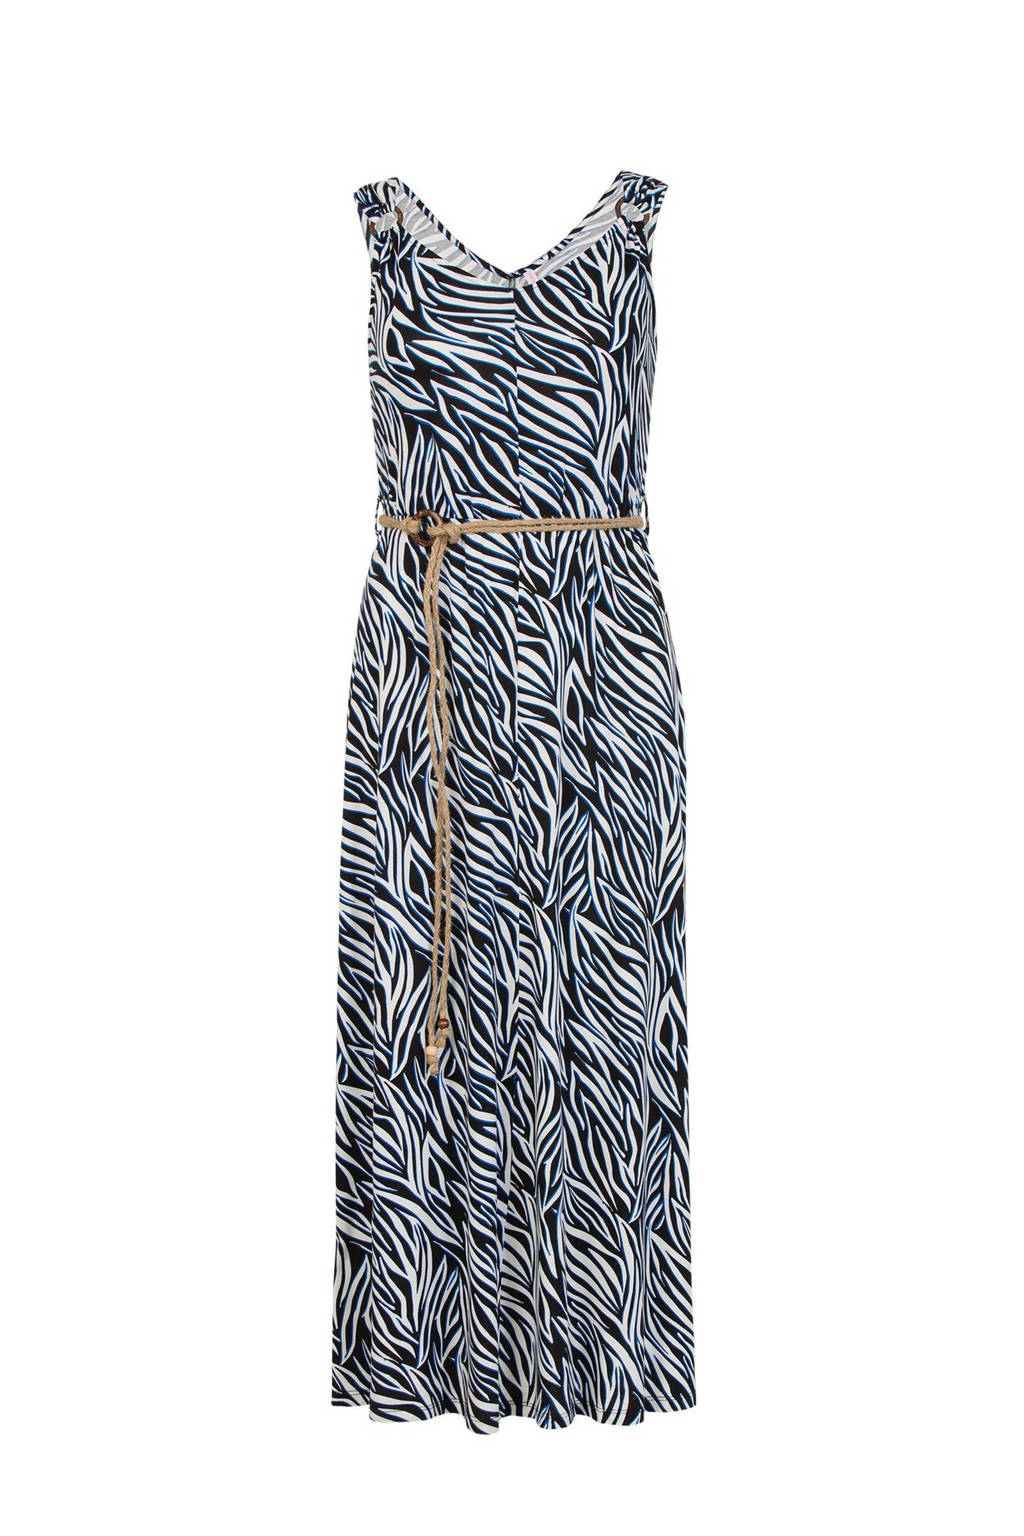 Miss Etam Regulier maxi jurk met zebraprint en open detail zwart/wit, Zwart/wit